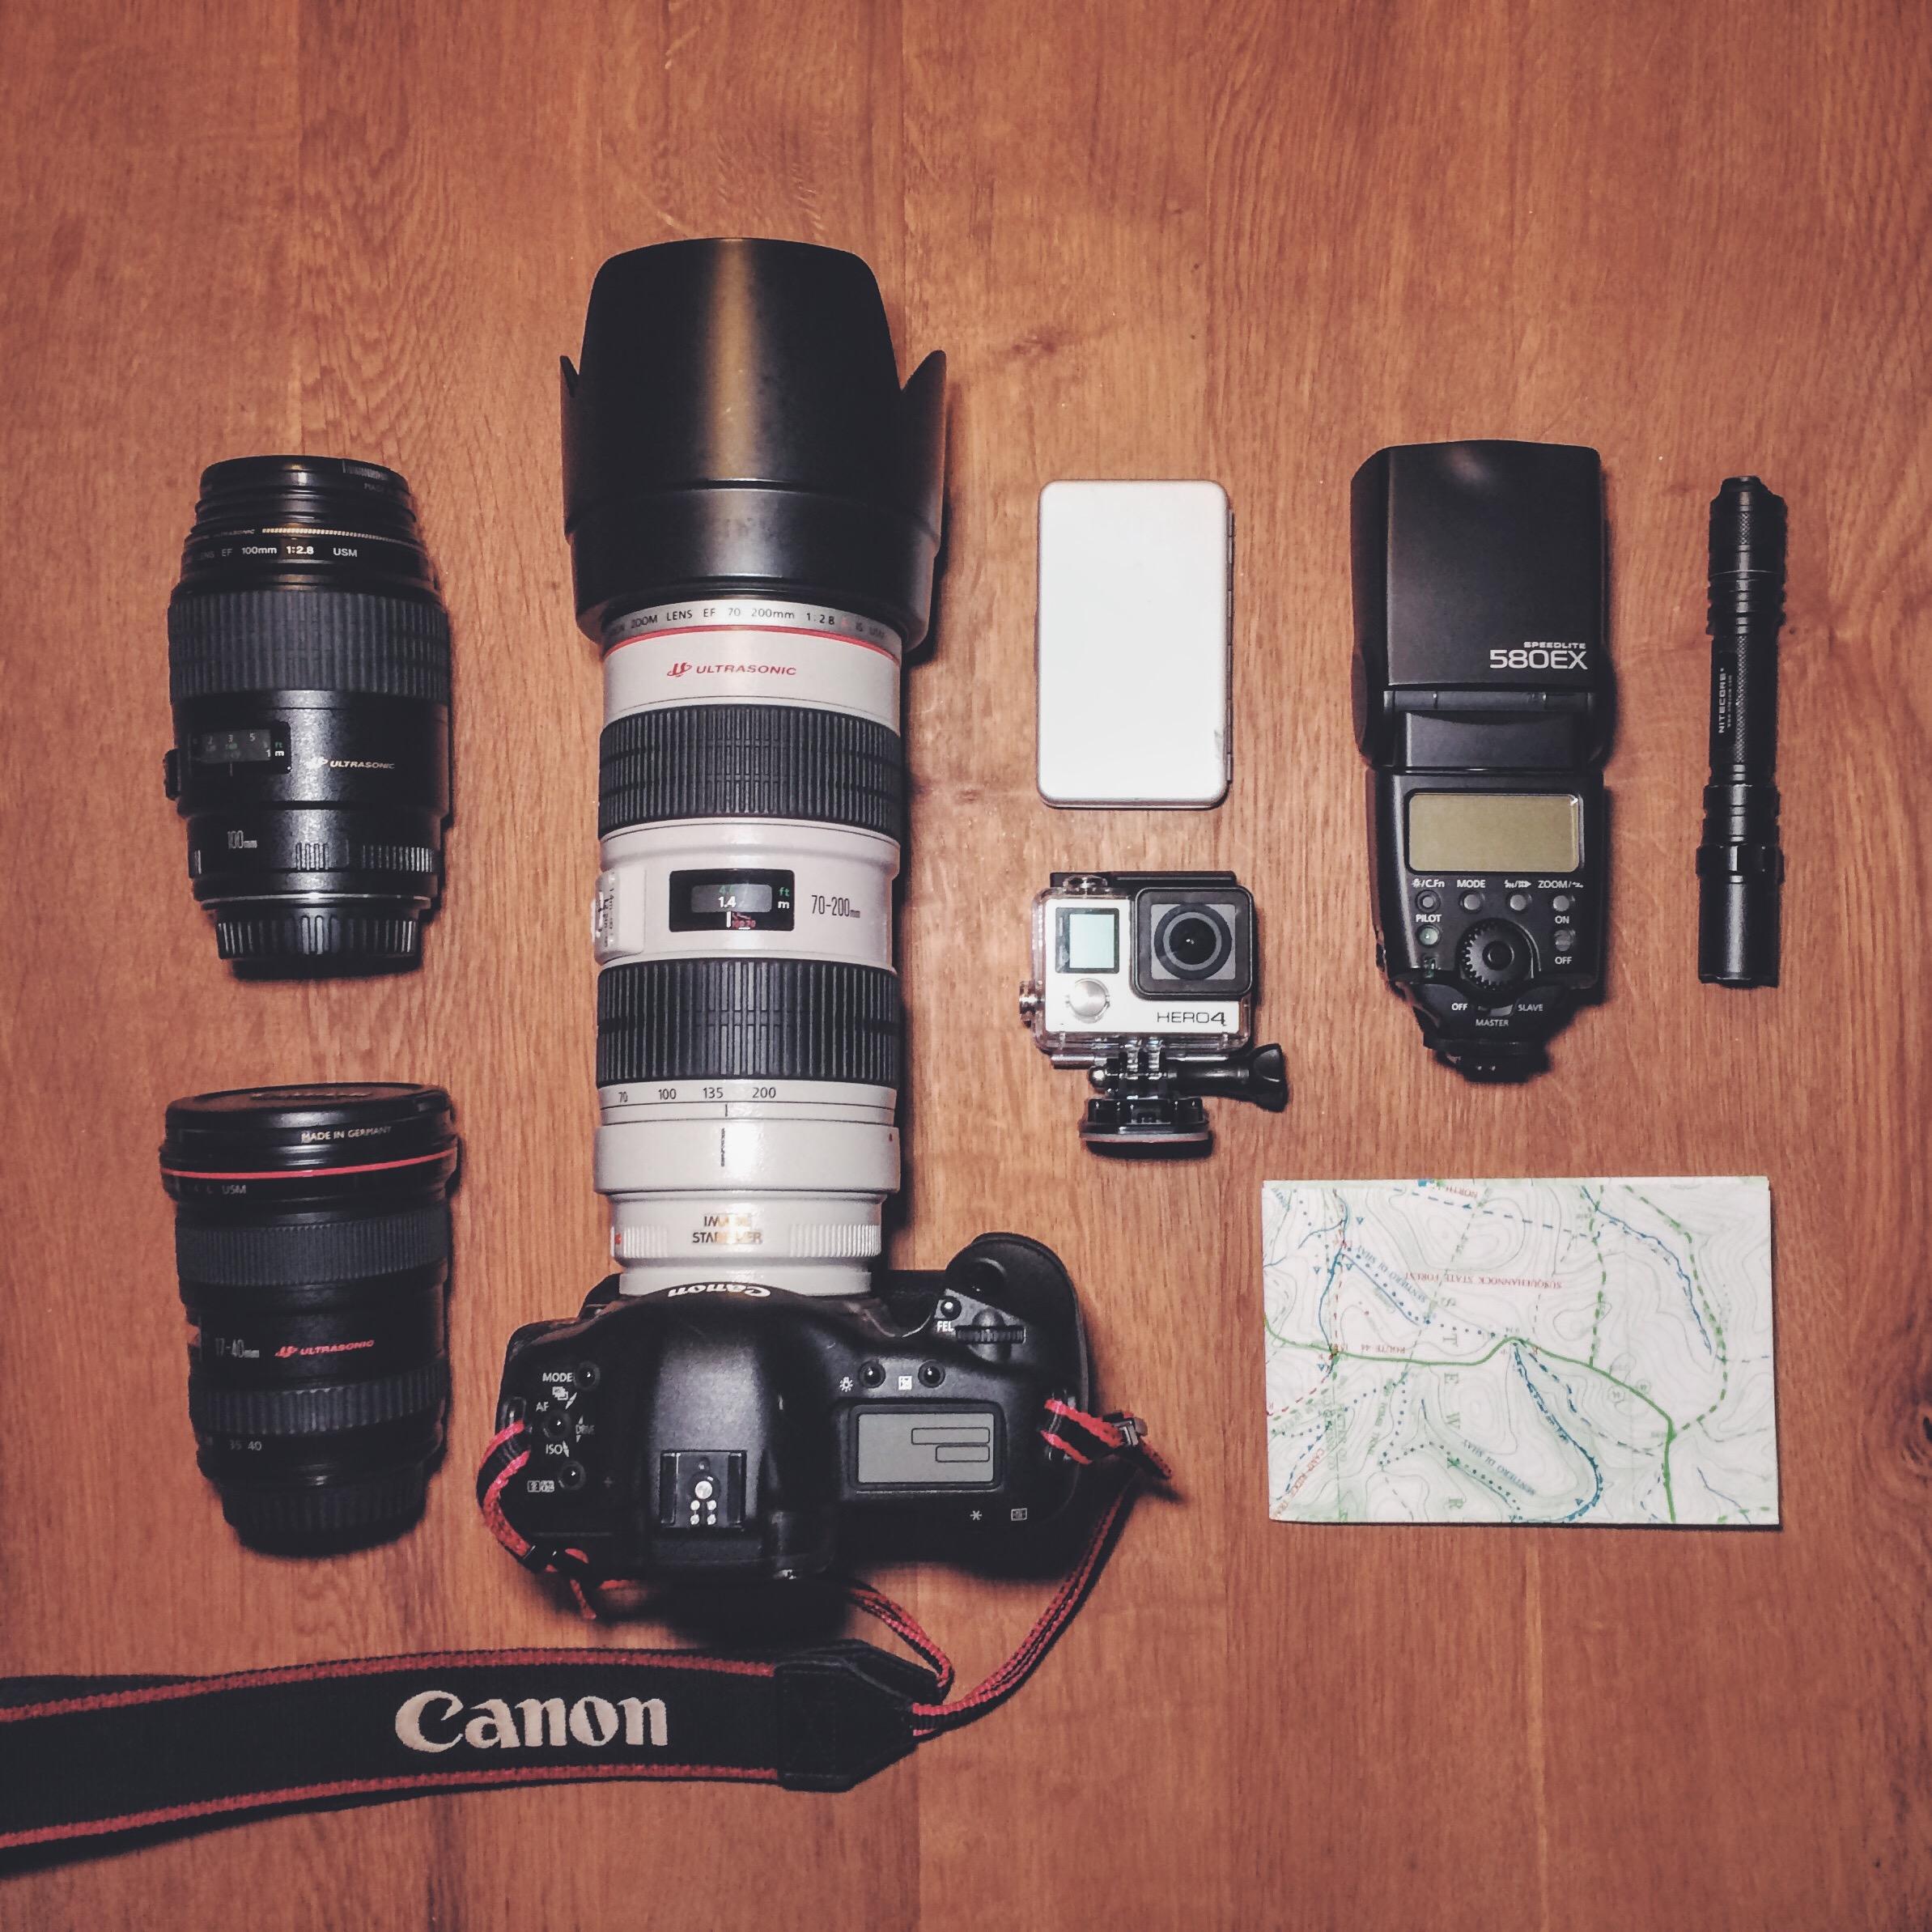 camera-IMG_9738.JPG